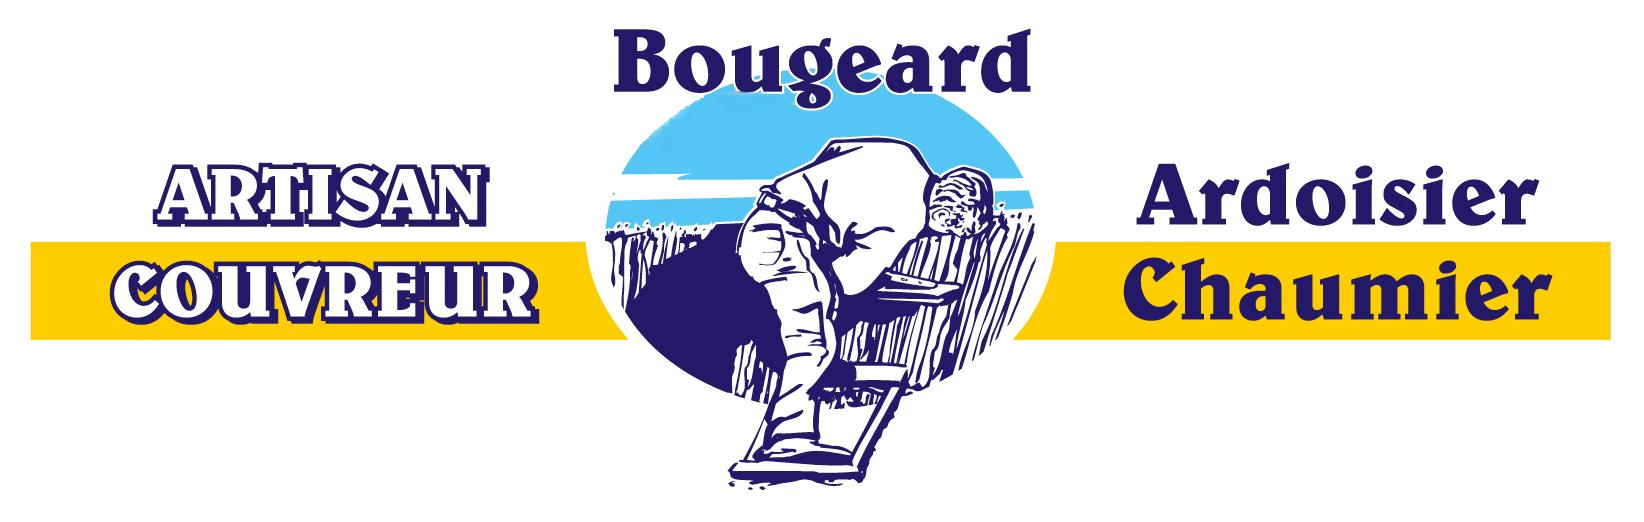 Bougeard - Ardoisier Chaumier Zingueur Isolation